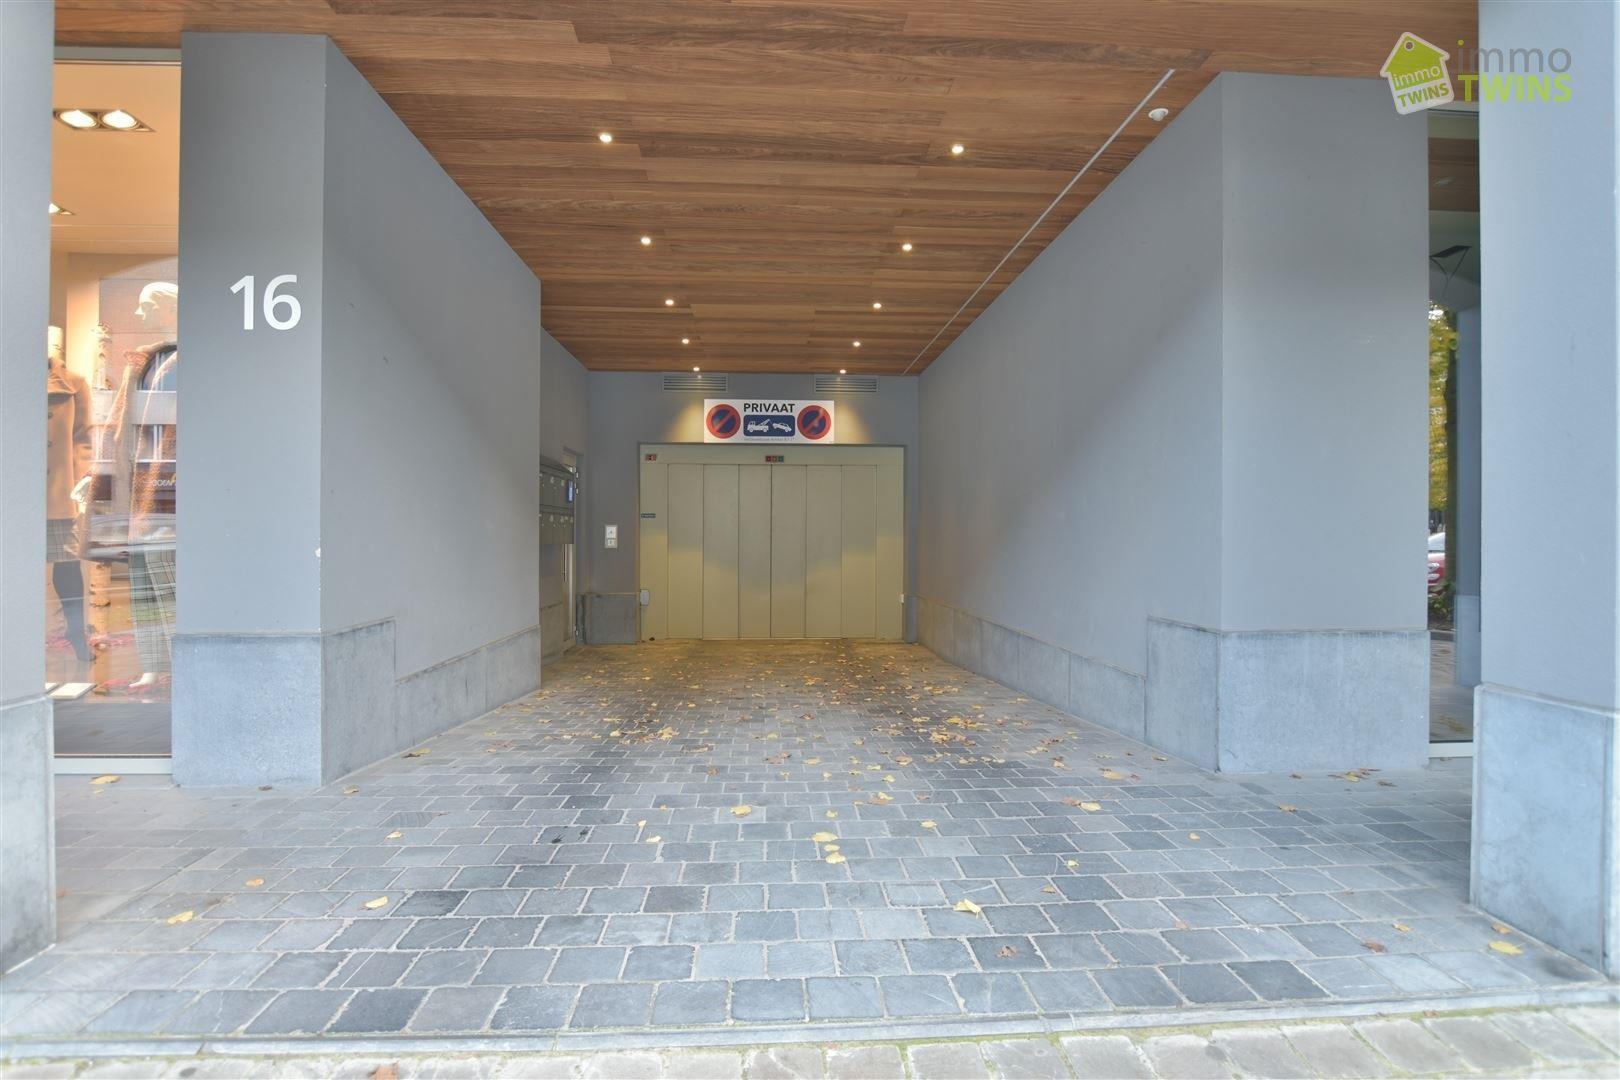 Foto 24 : Appartement te 9200 DENDERMONDE (België) - Prijs € 1.100